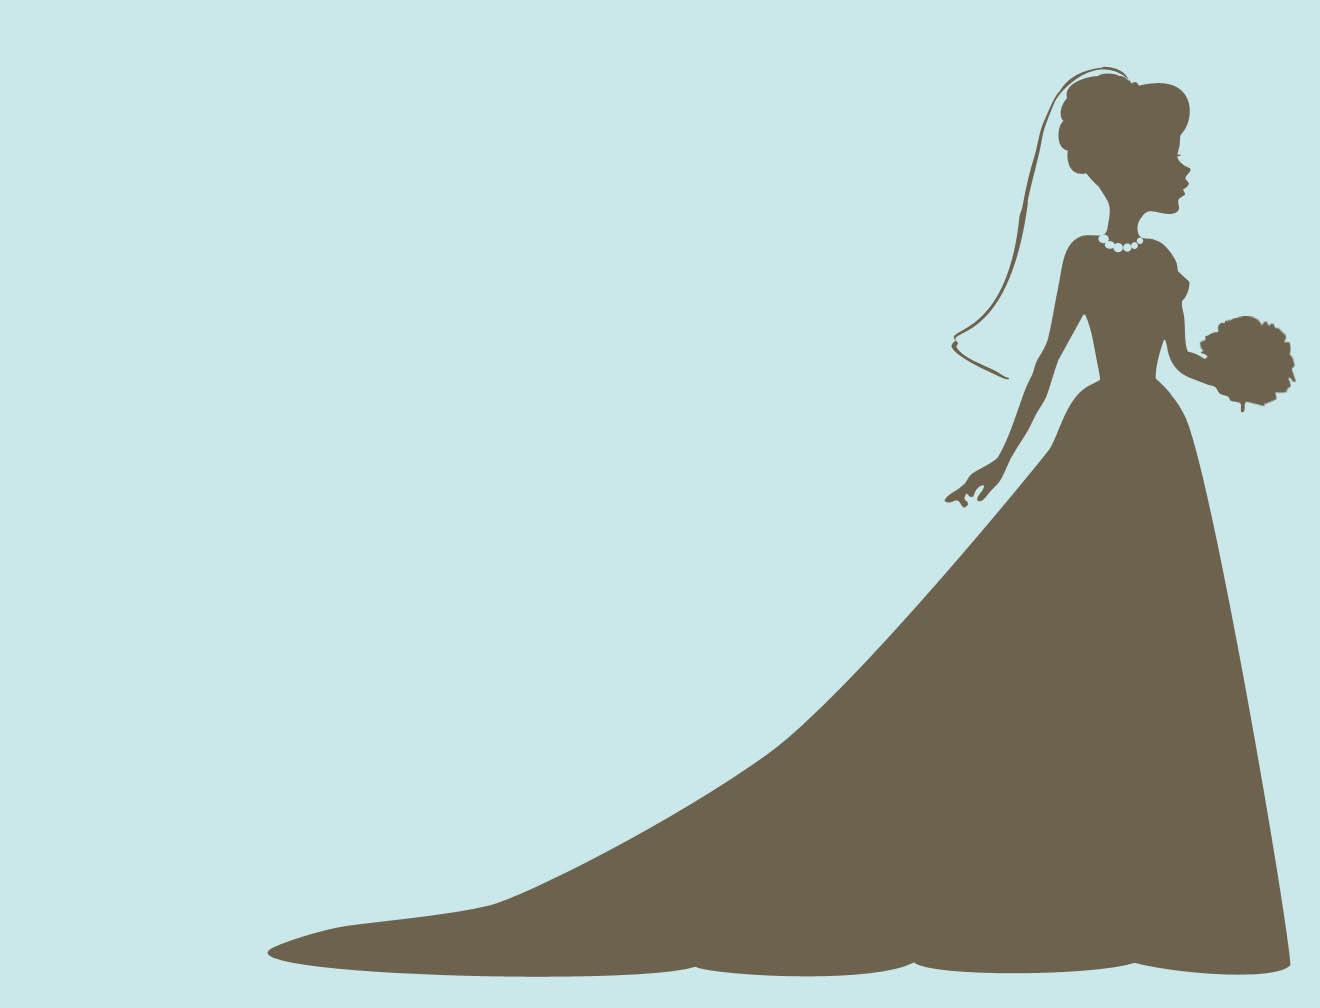 1320x1008 Impressive Clipart For Bridal Shower Invitations Free